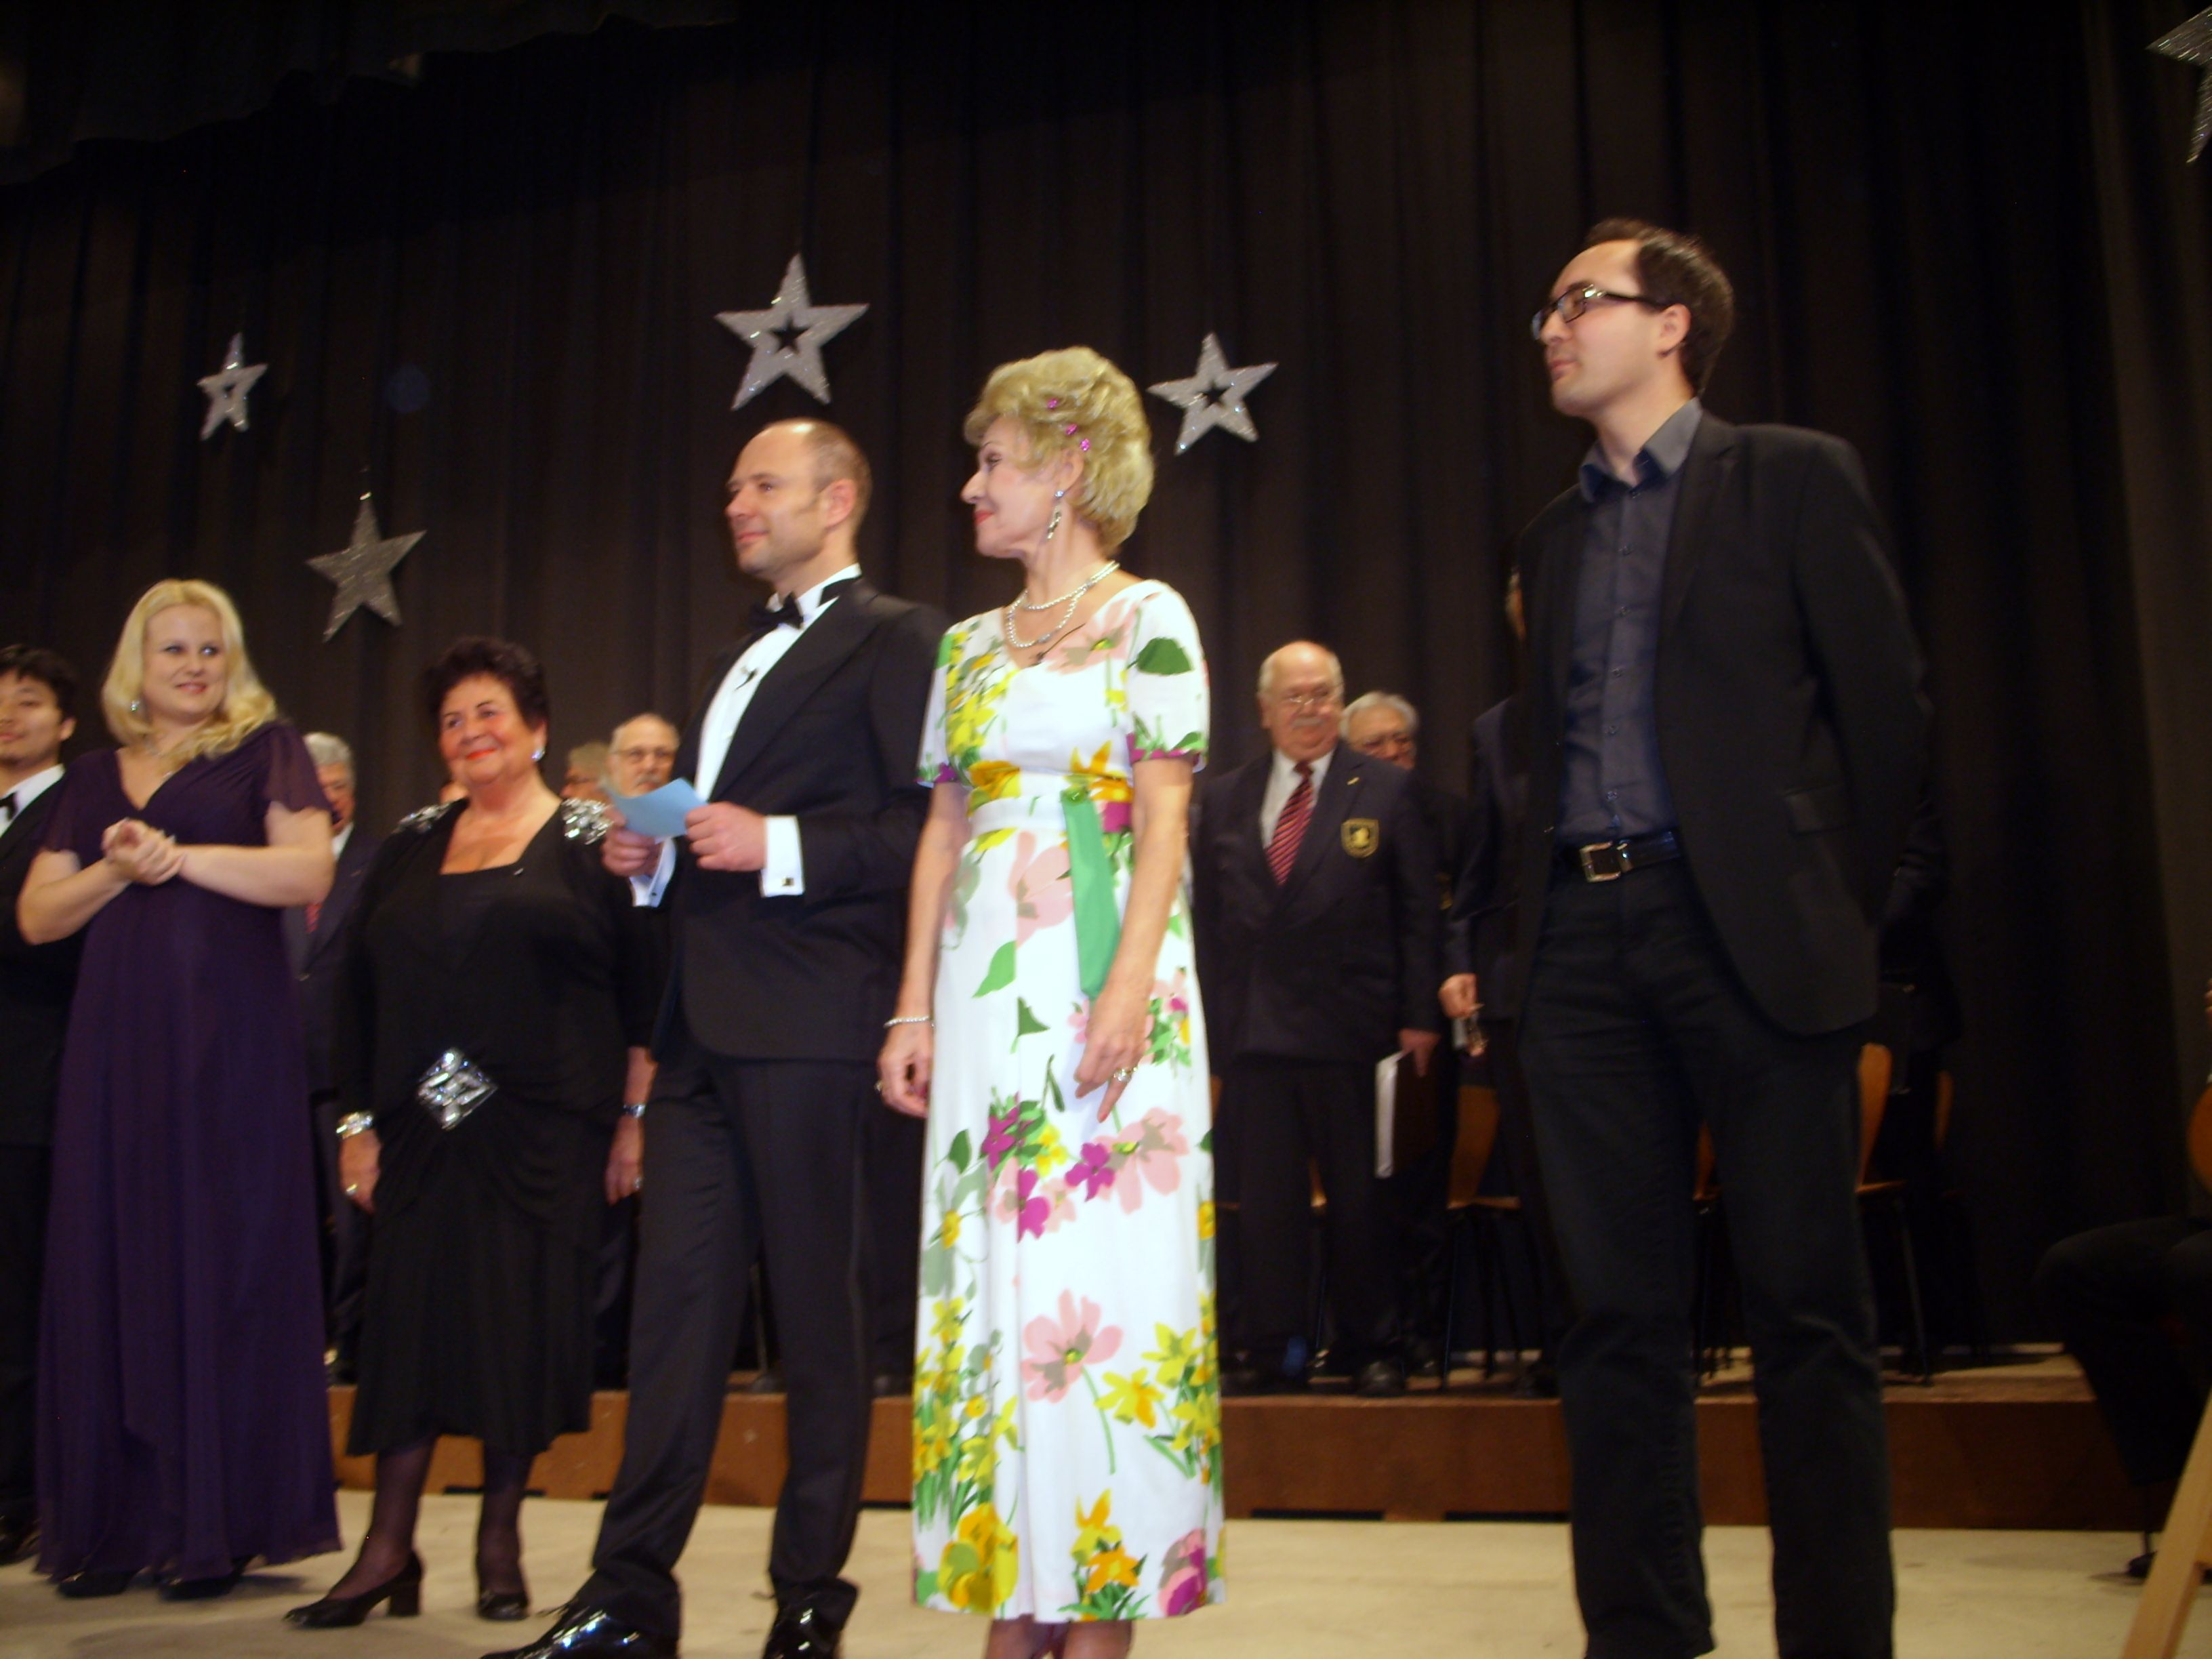 Sabina Zapior / Marika Sobotka / Günther Strahlegger / Ingrid Schlemmer / Reinhard Trinkler